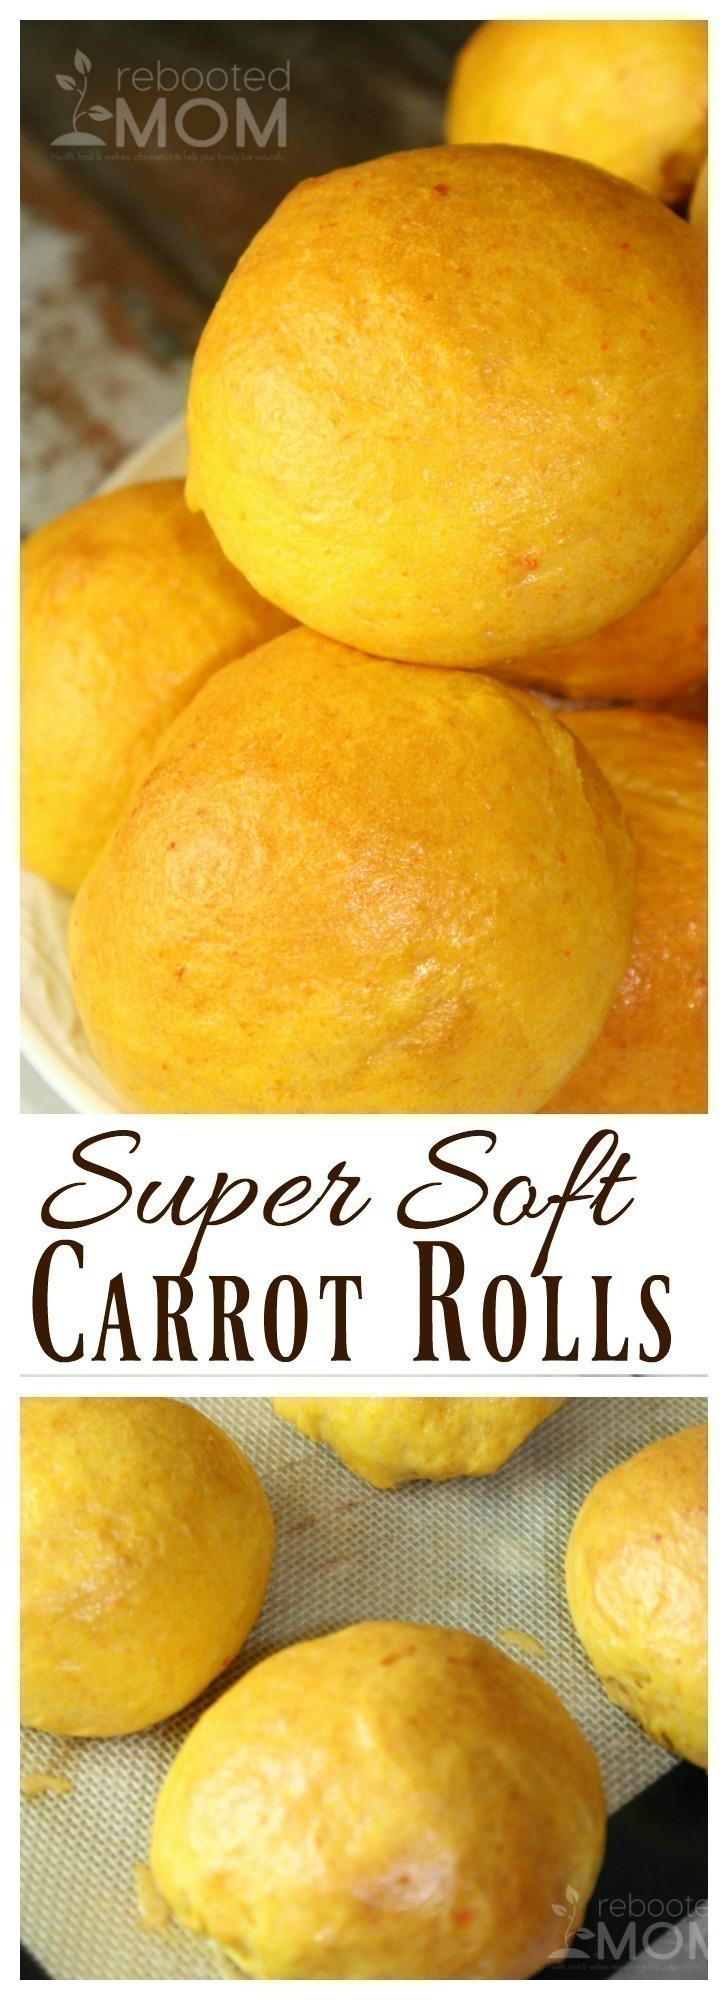 Super Soft Carrot Rolls